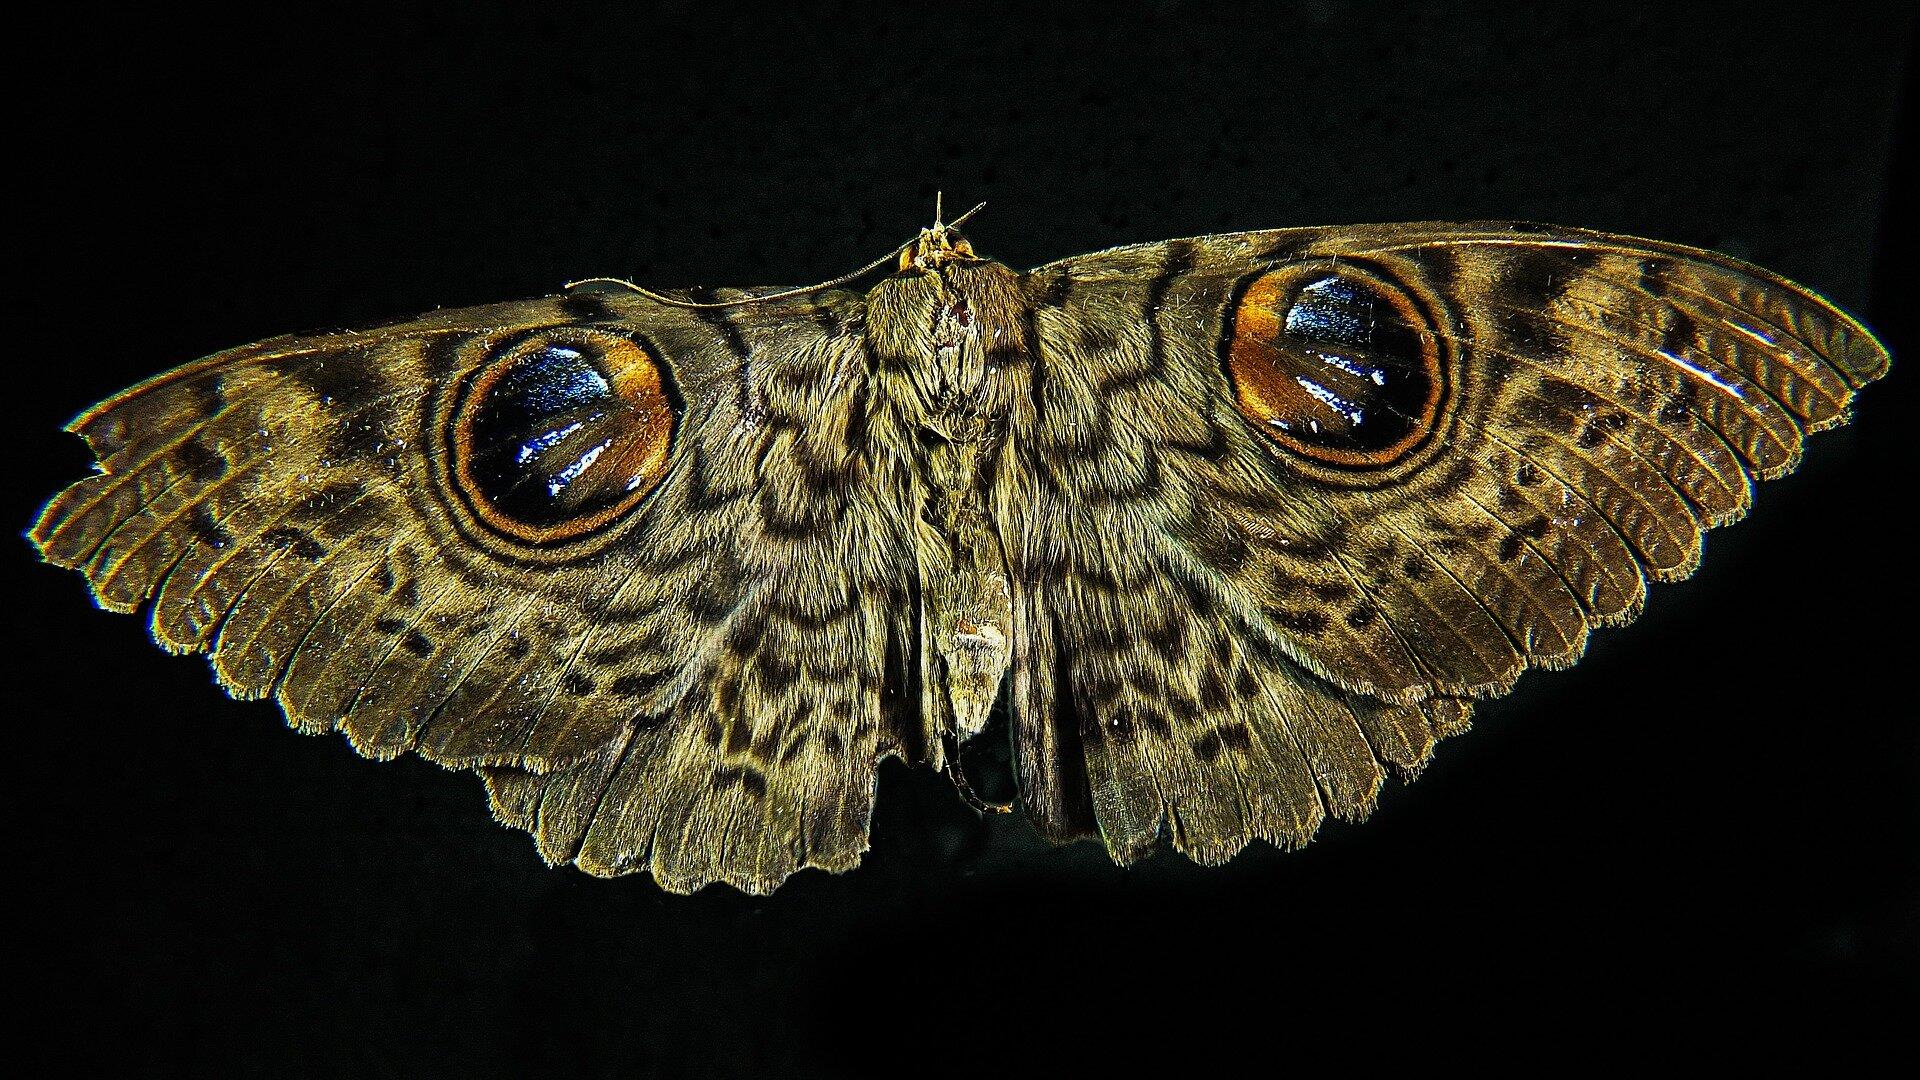 moth-195882_1920.jpg